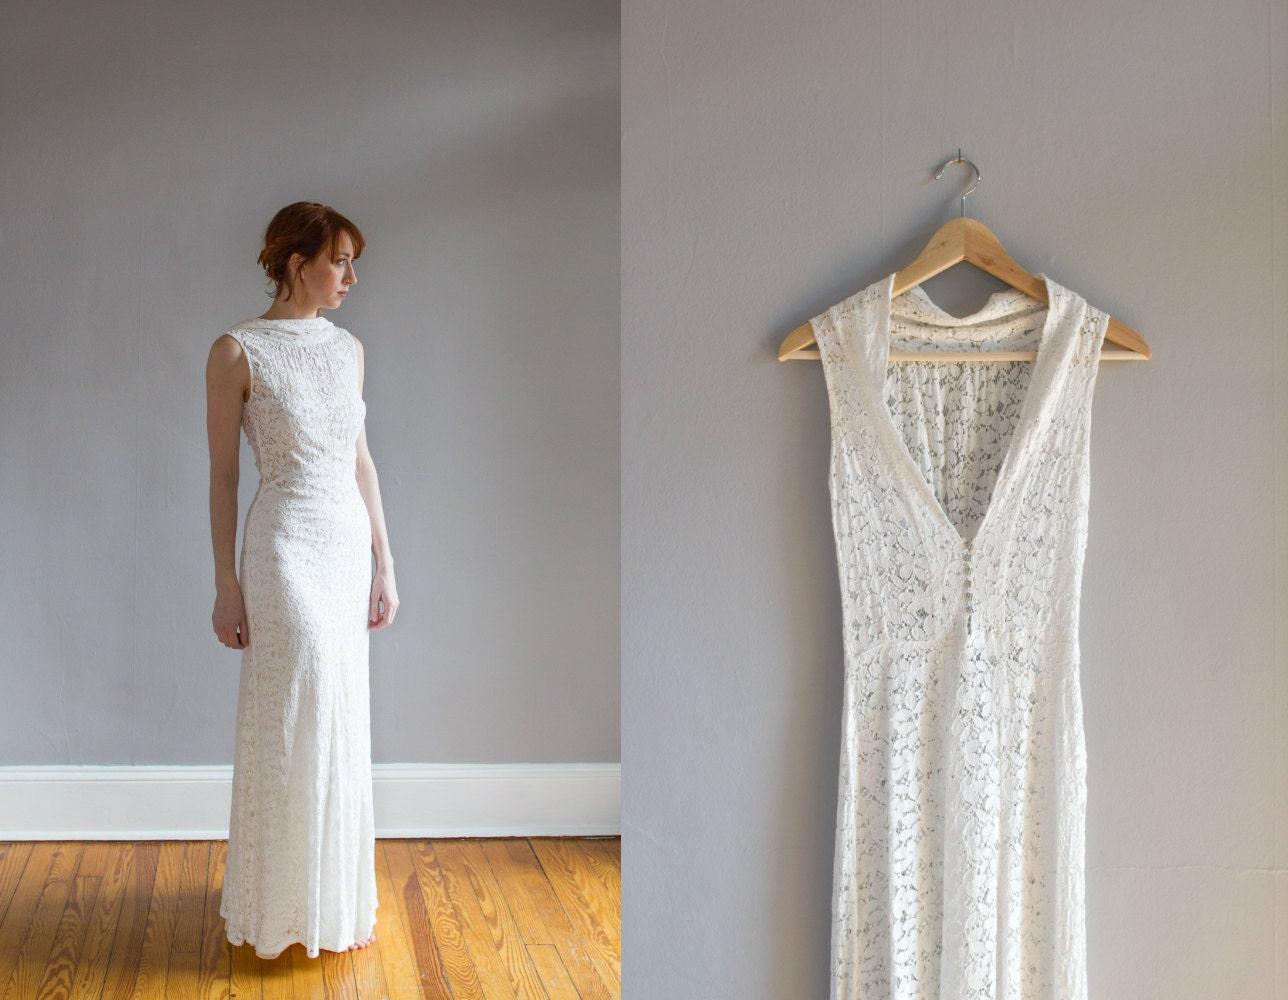 Art Deco Wedding Gowns: 1930's Lace Wedding Gown With Bolero / Art Deco / Bias Cut